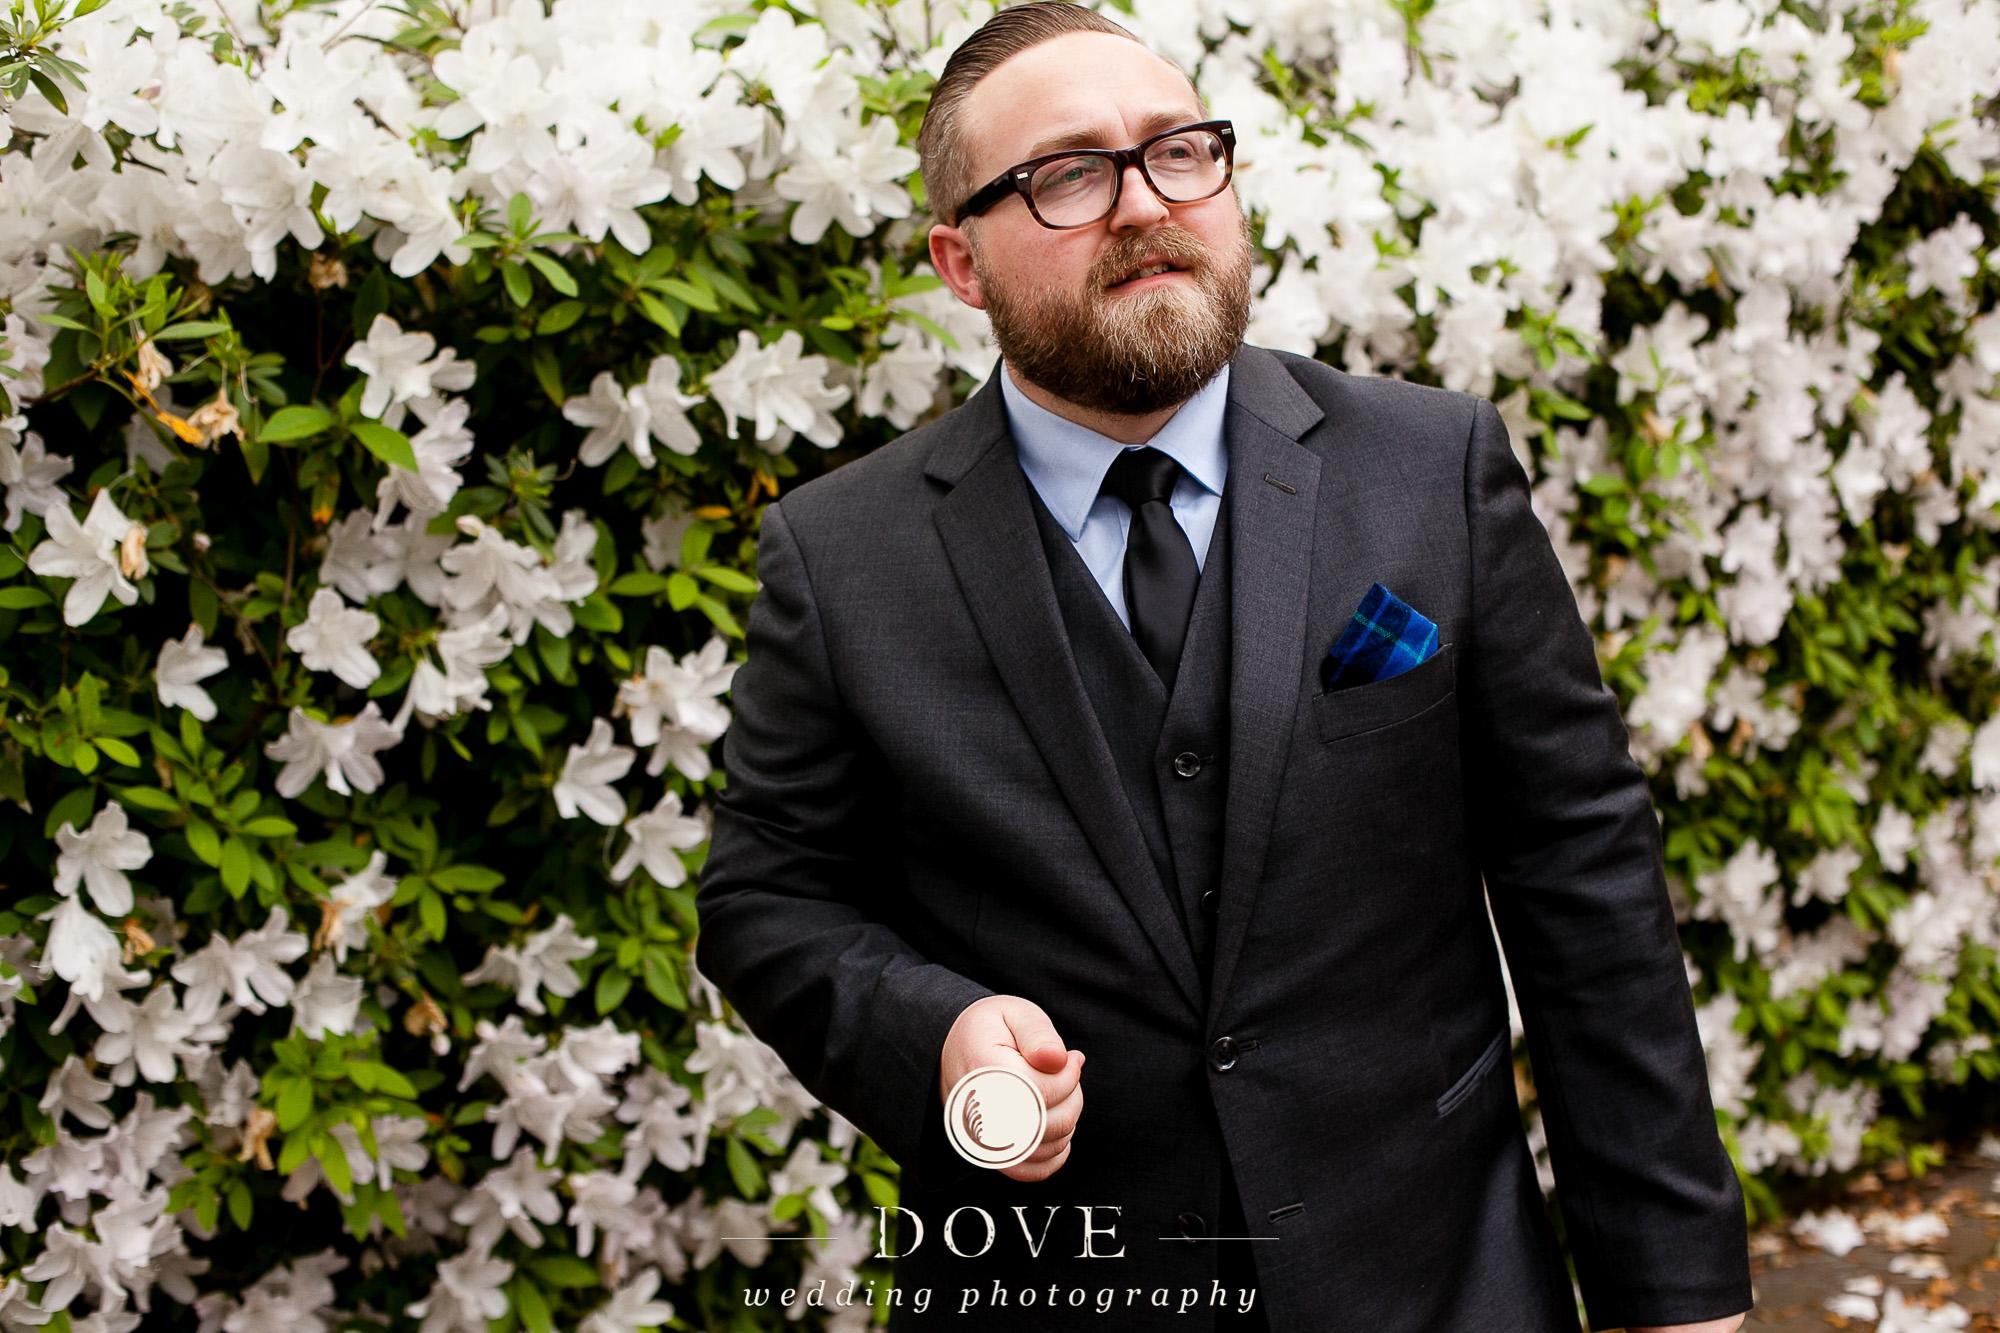 photo courtesy of Dove Photography